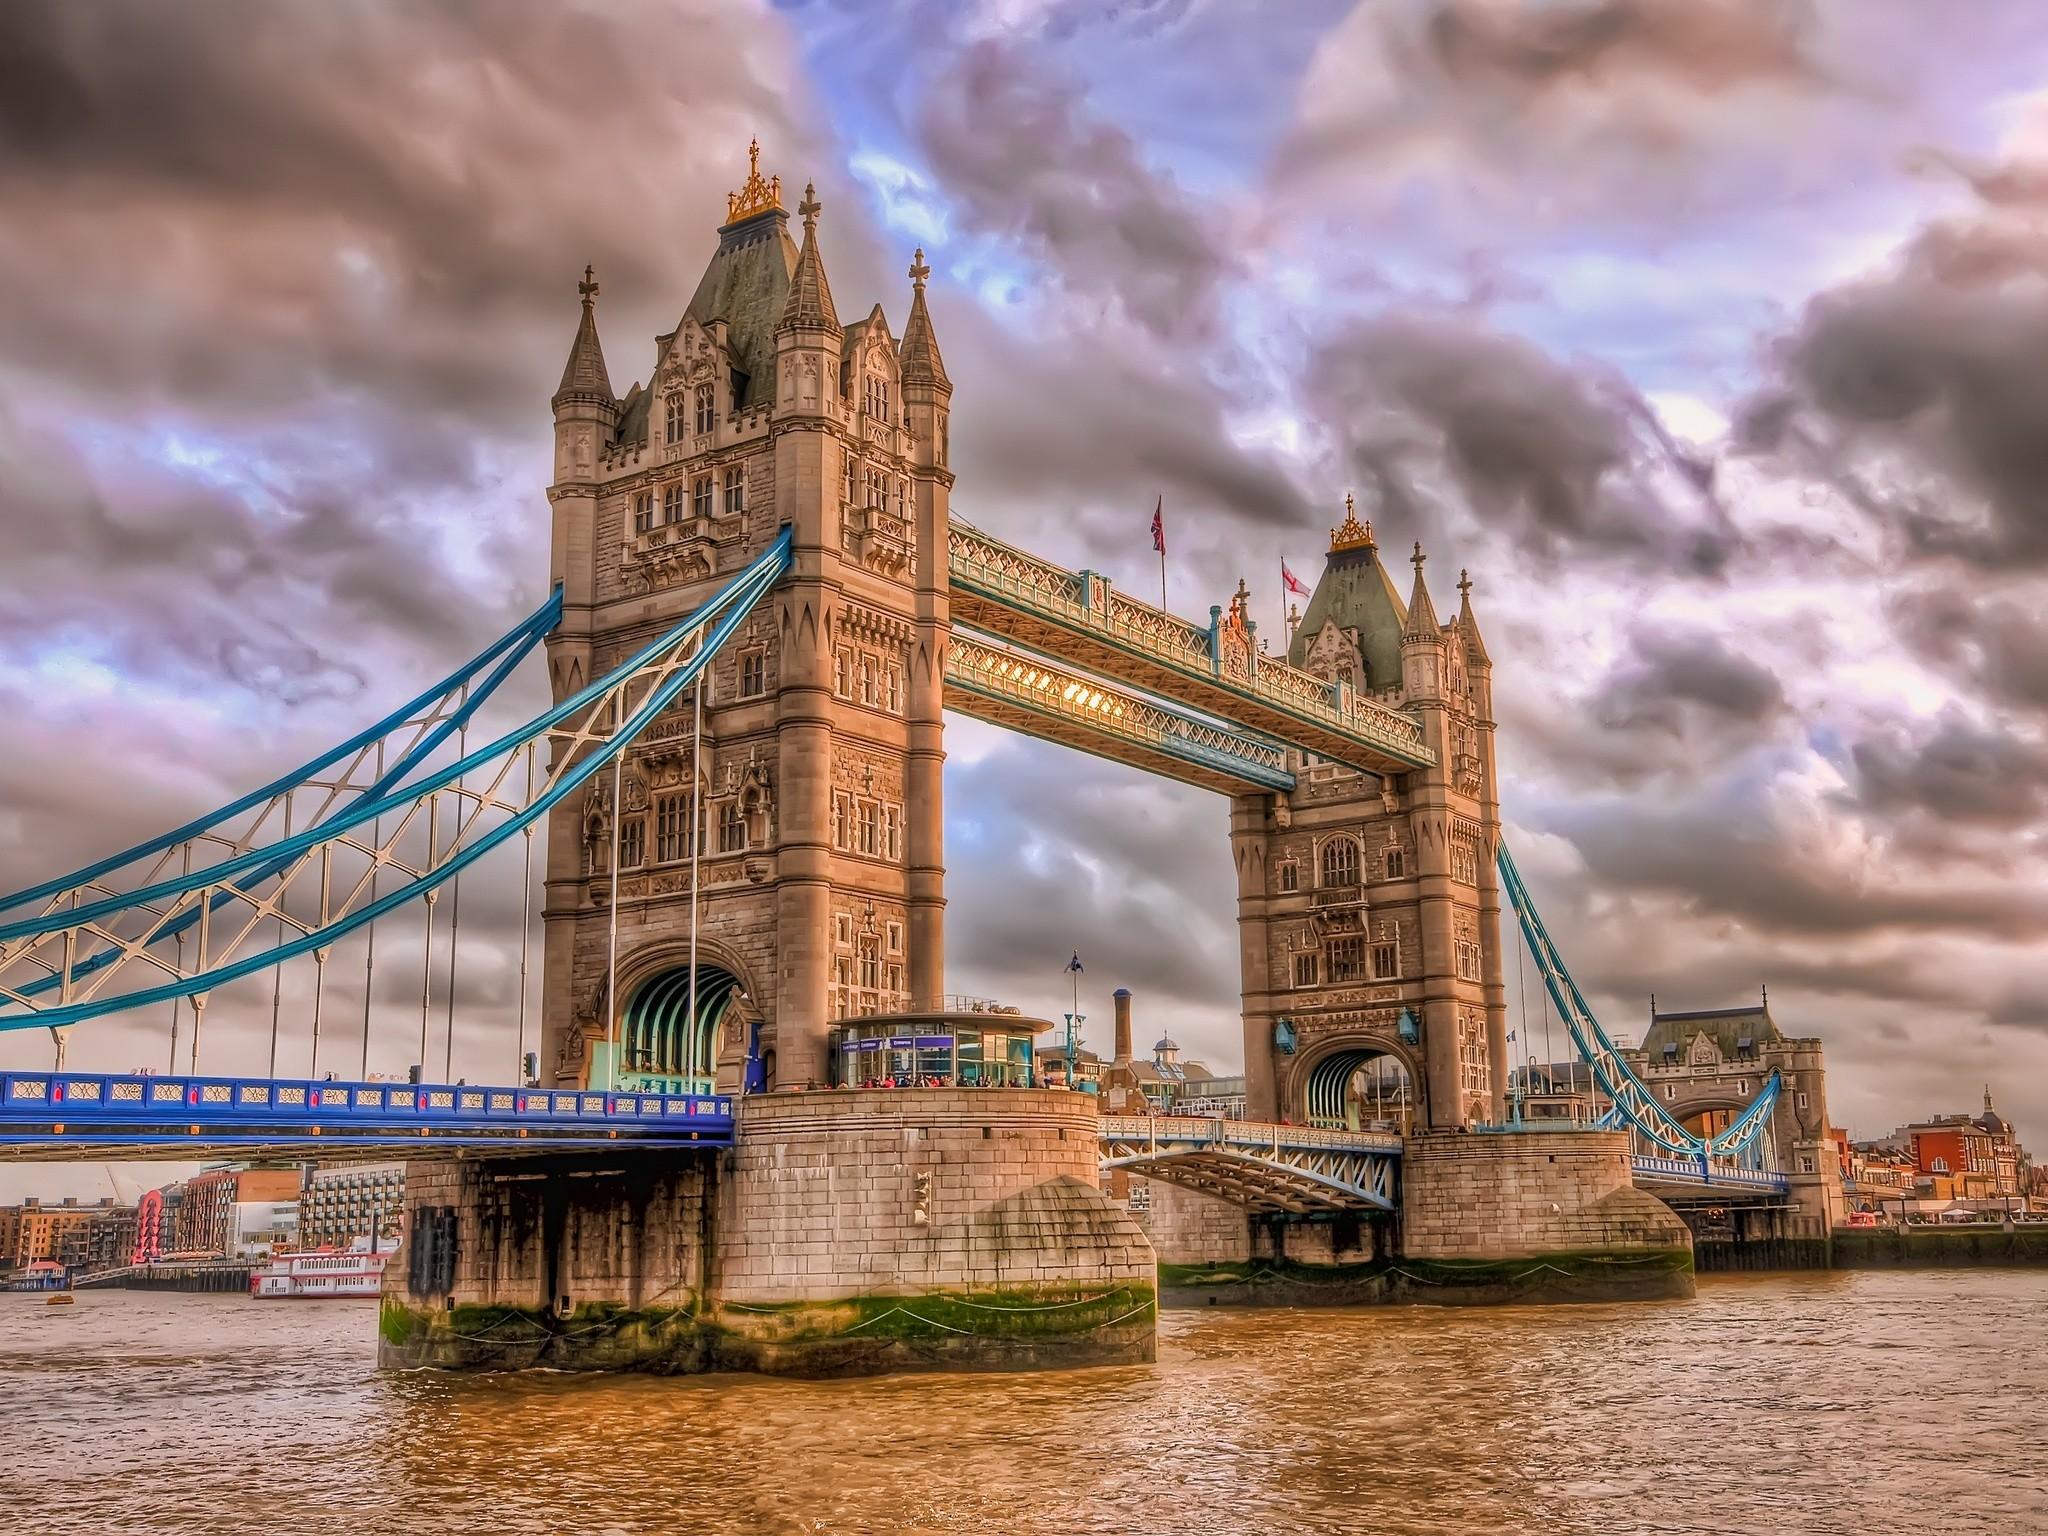 Res: 2048x1536, Tower Bridge Wallpapers 21 - 2048 X 1536